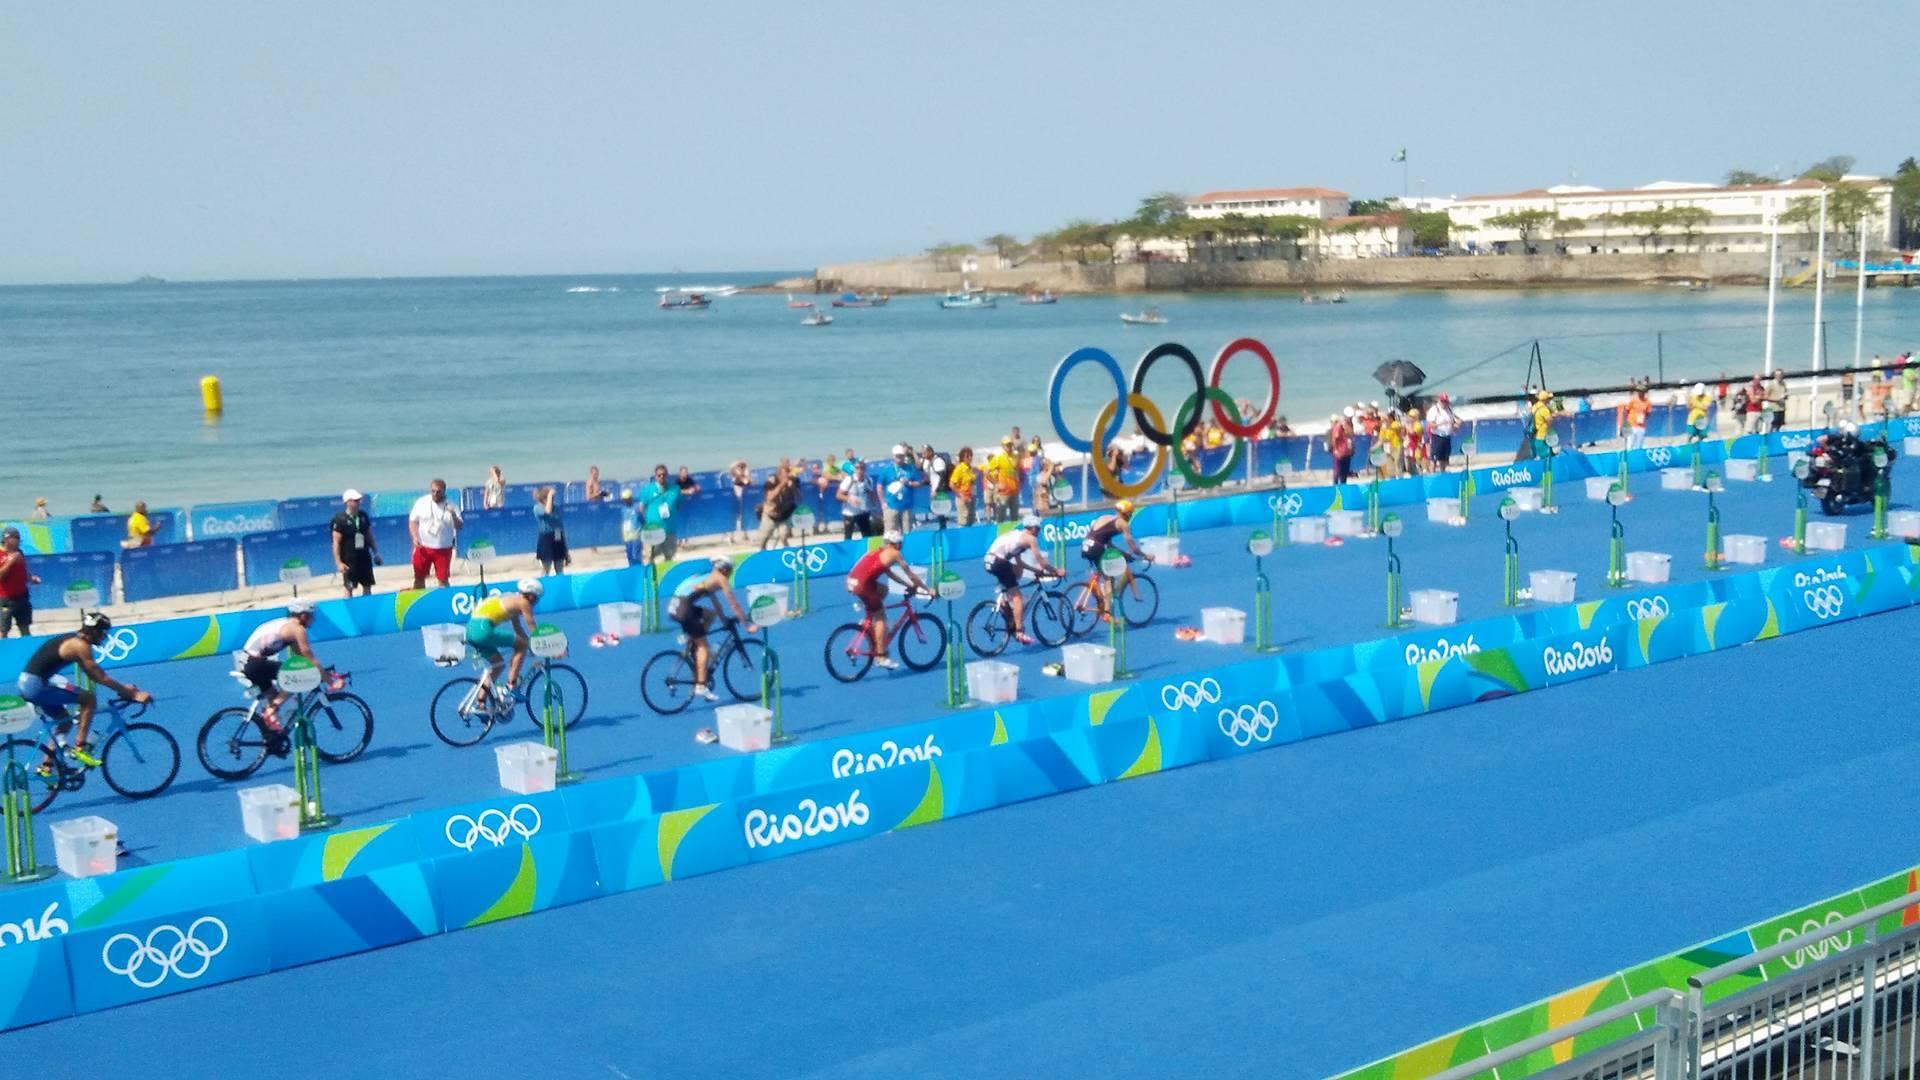 Rio Marten fiets1